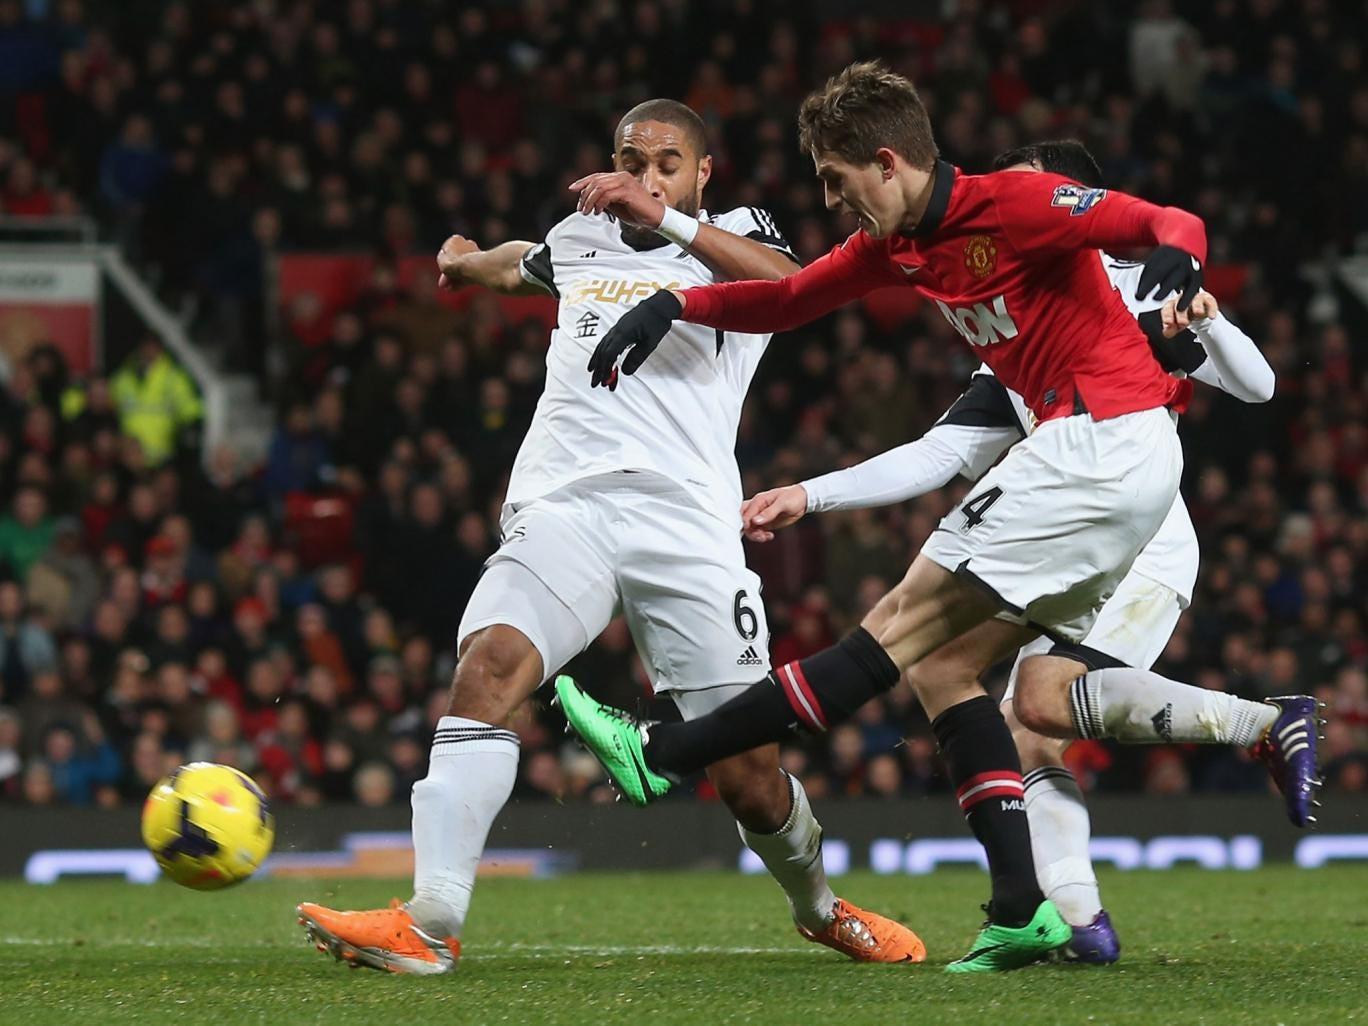 Adnan Januzaj goes close in United's win over Swansea